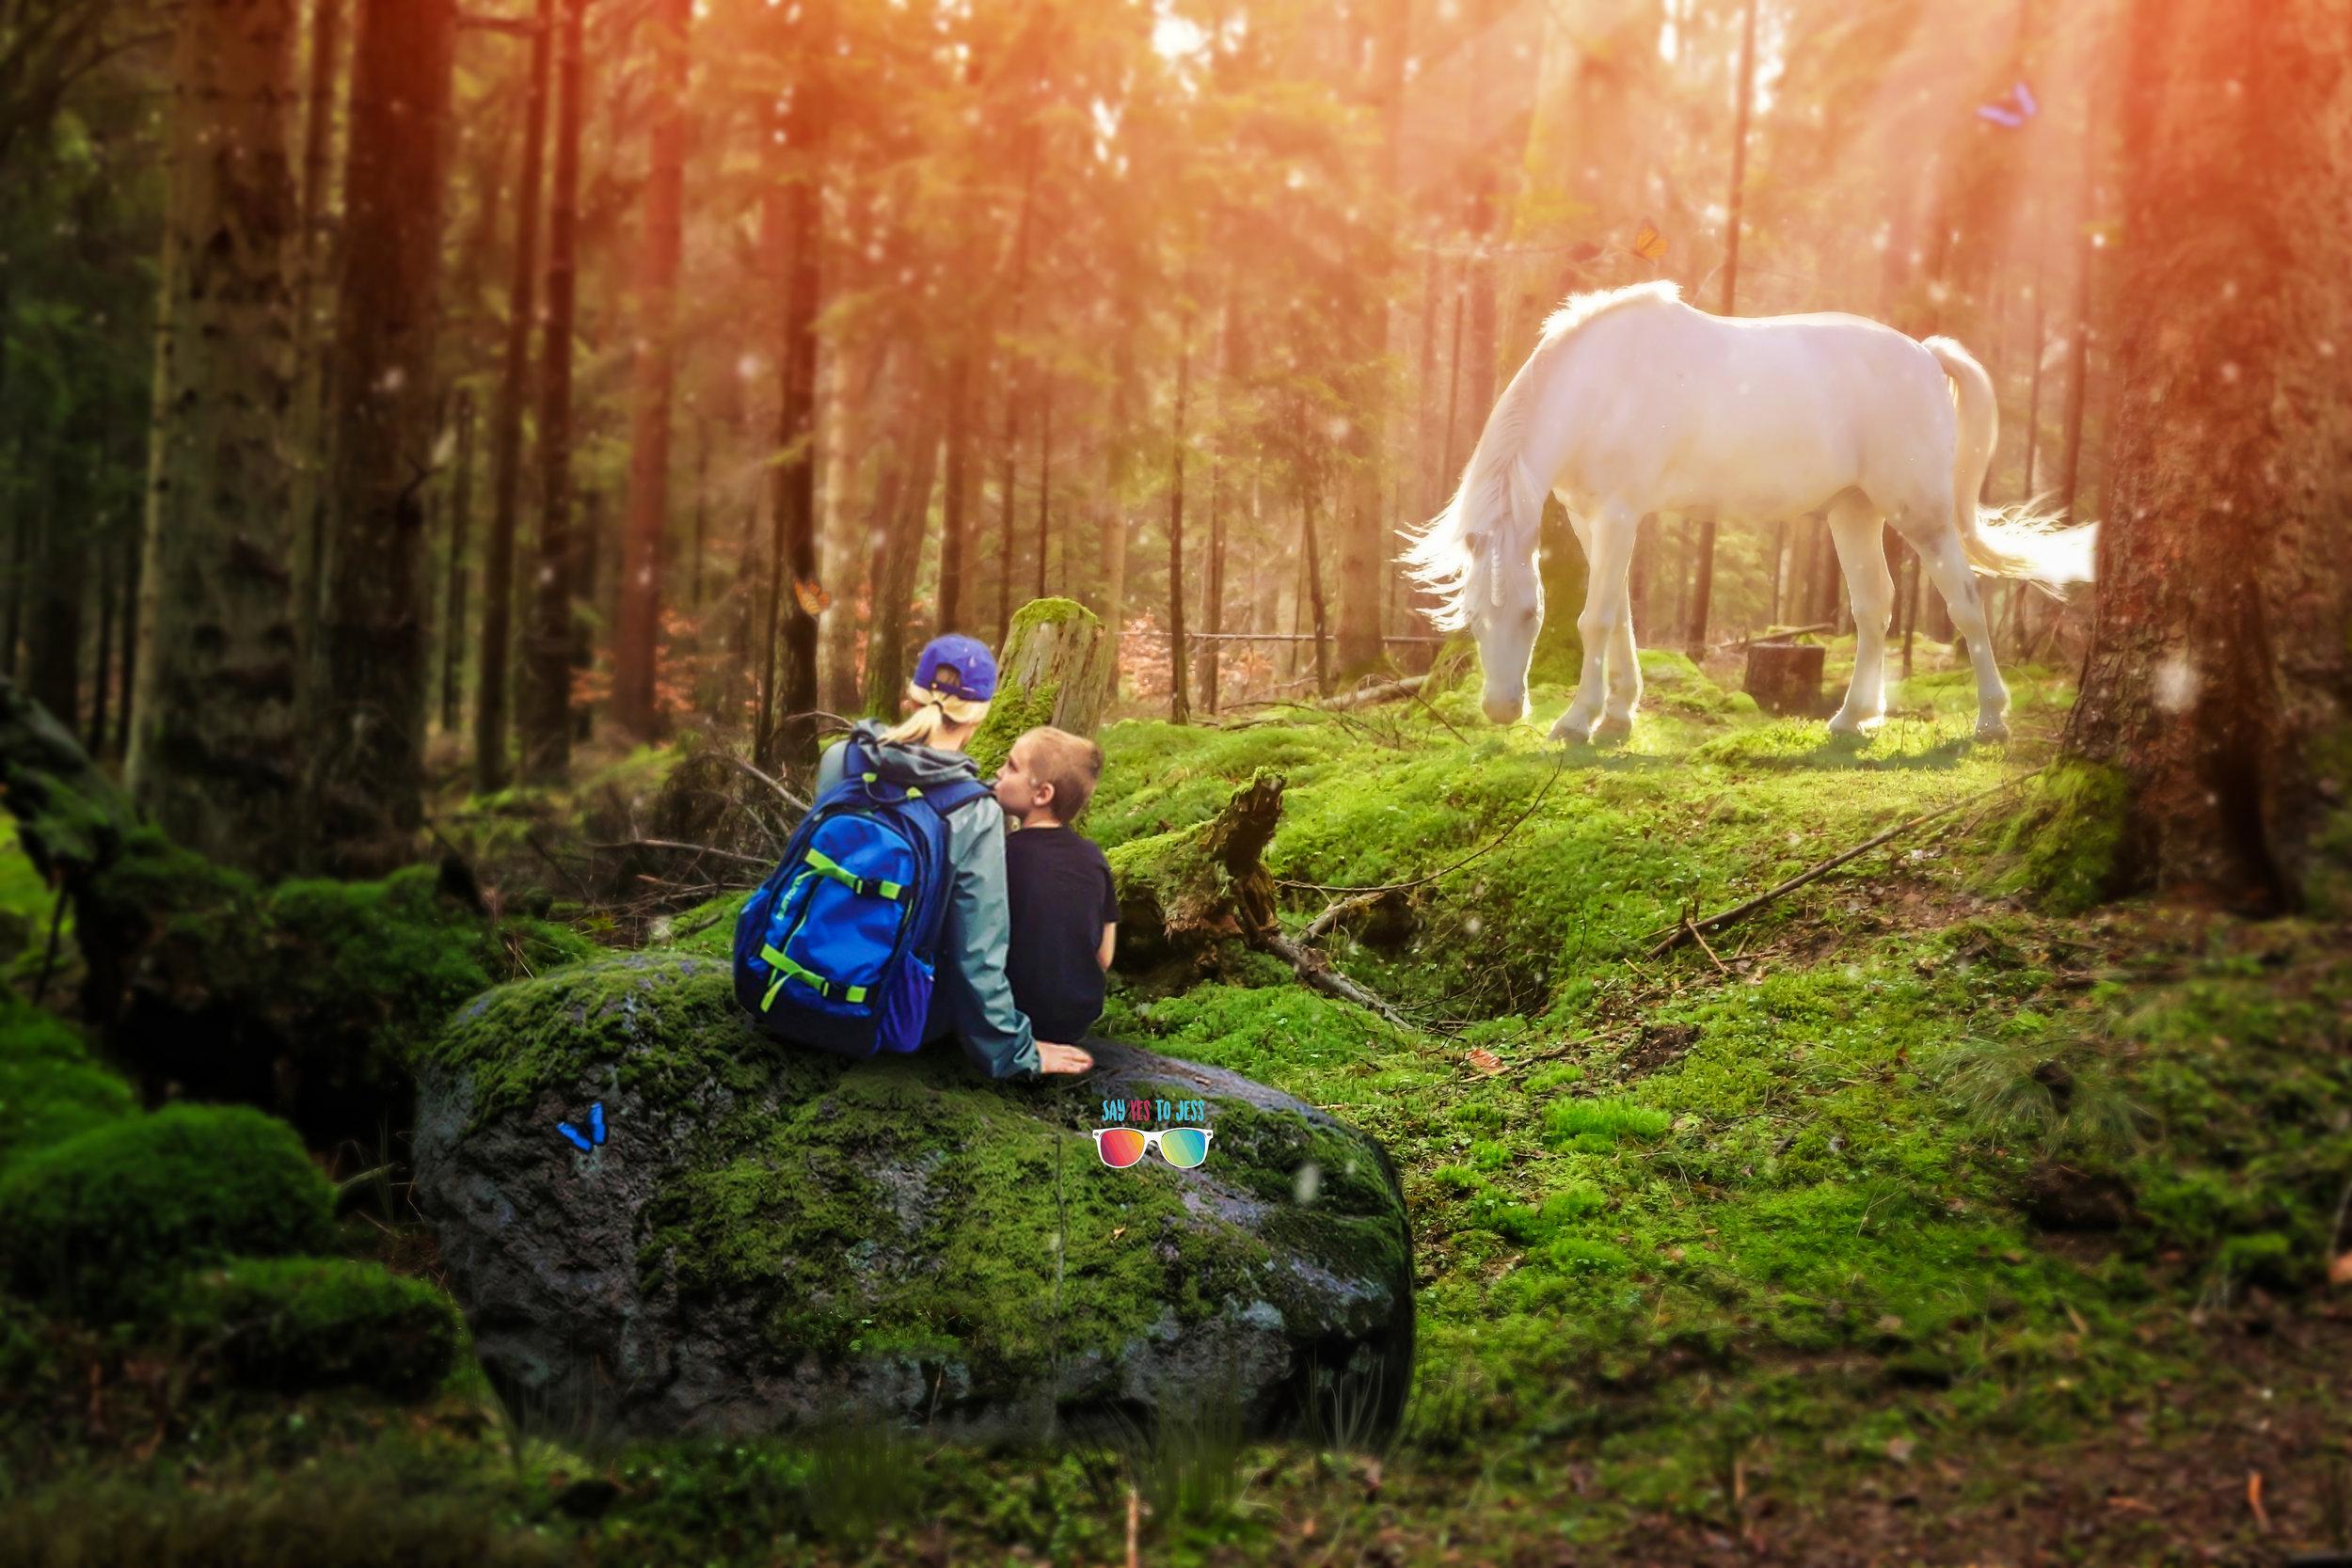 Unicorn experience in Cincinnati ohio Unicorn Photoshoot Say Yes To Jess Cincy photographer.jpg